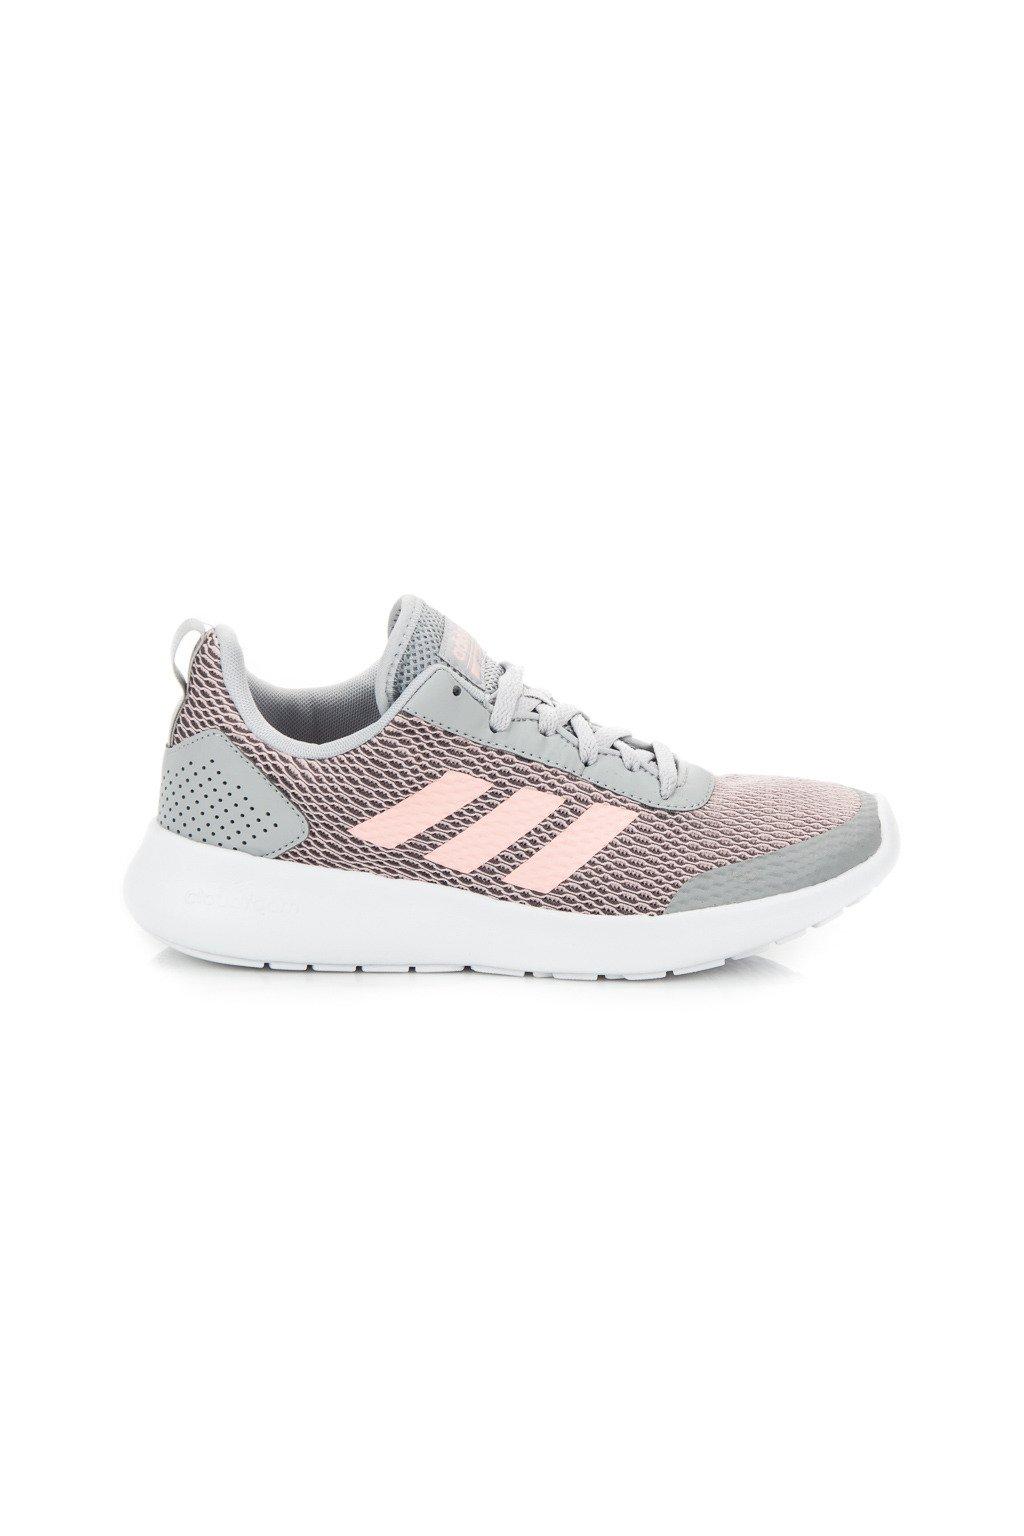 b17b215247 1055766 damske-sive-tenisky-adidas-element-race.jpg 5c6745ea